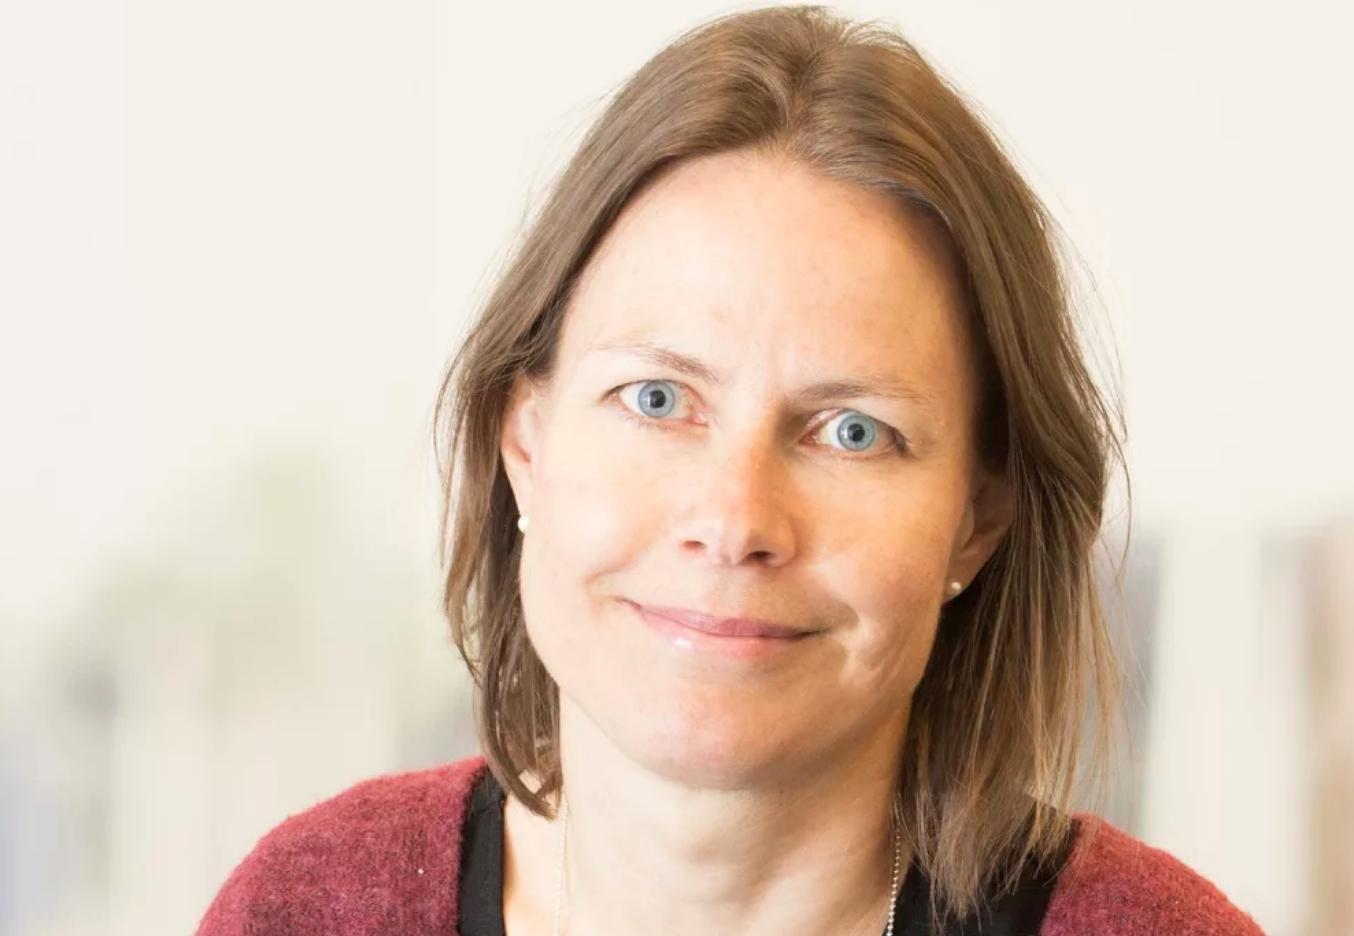 Svenske Sara Hallsund er ny marketingchef for Best Western Hotels & Resorts i Skandinavien. Foto: Best Western.